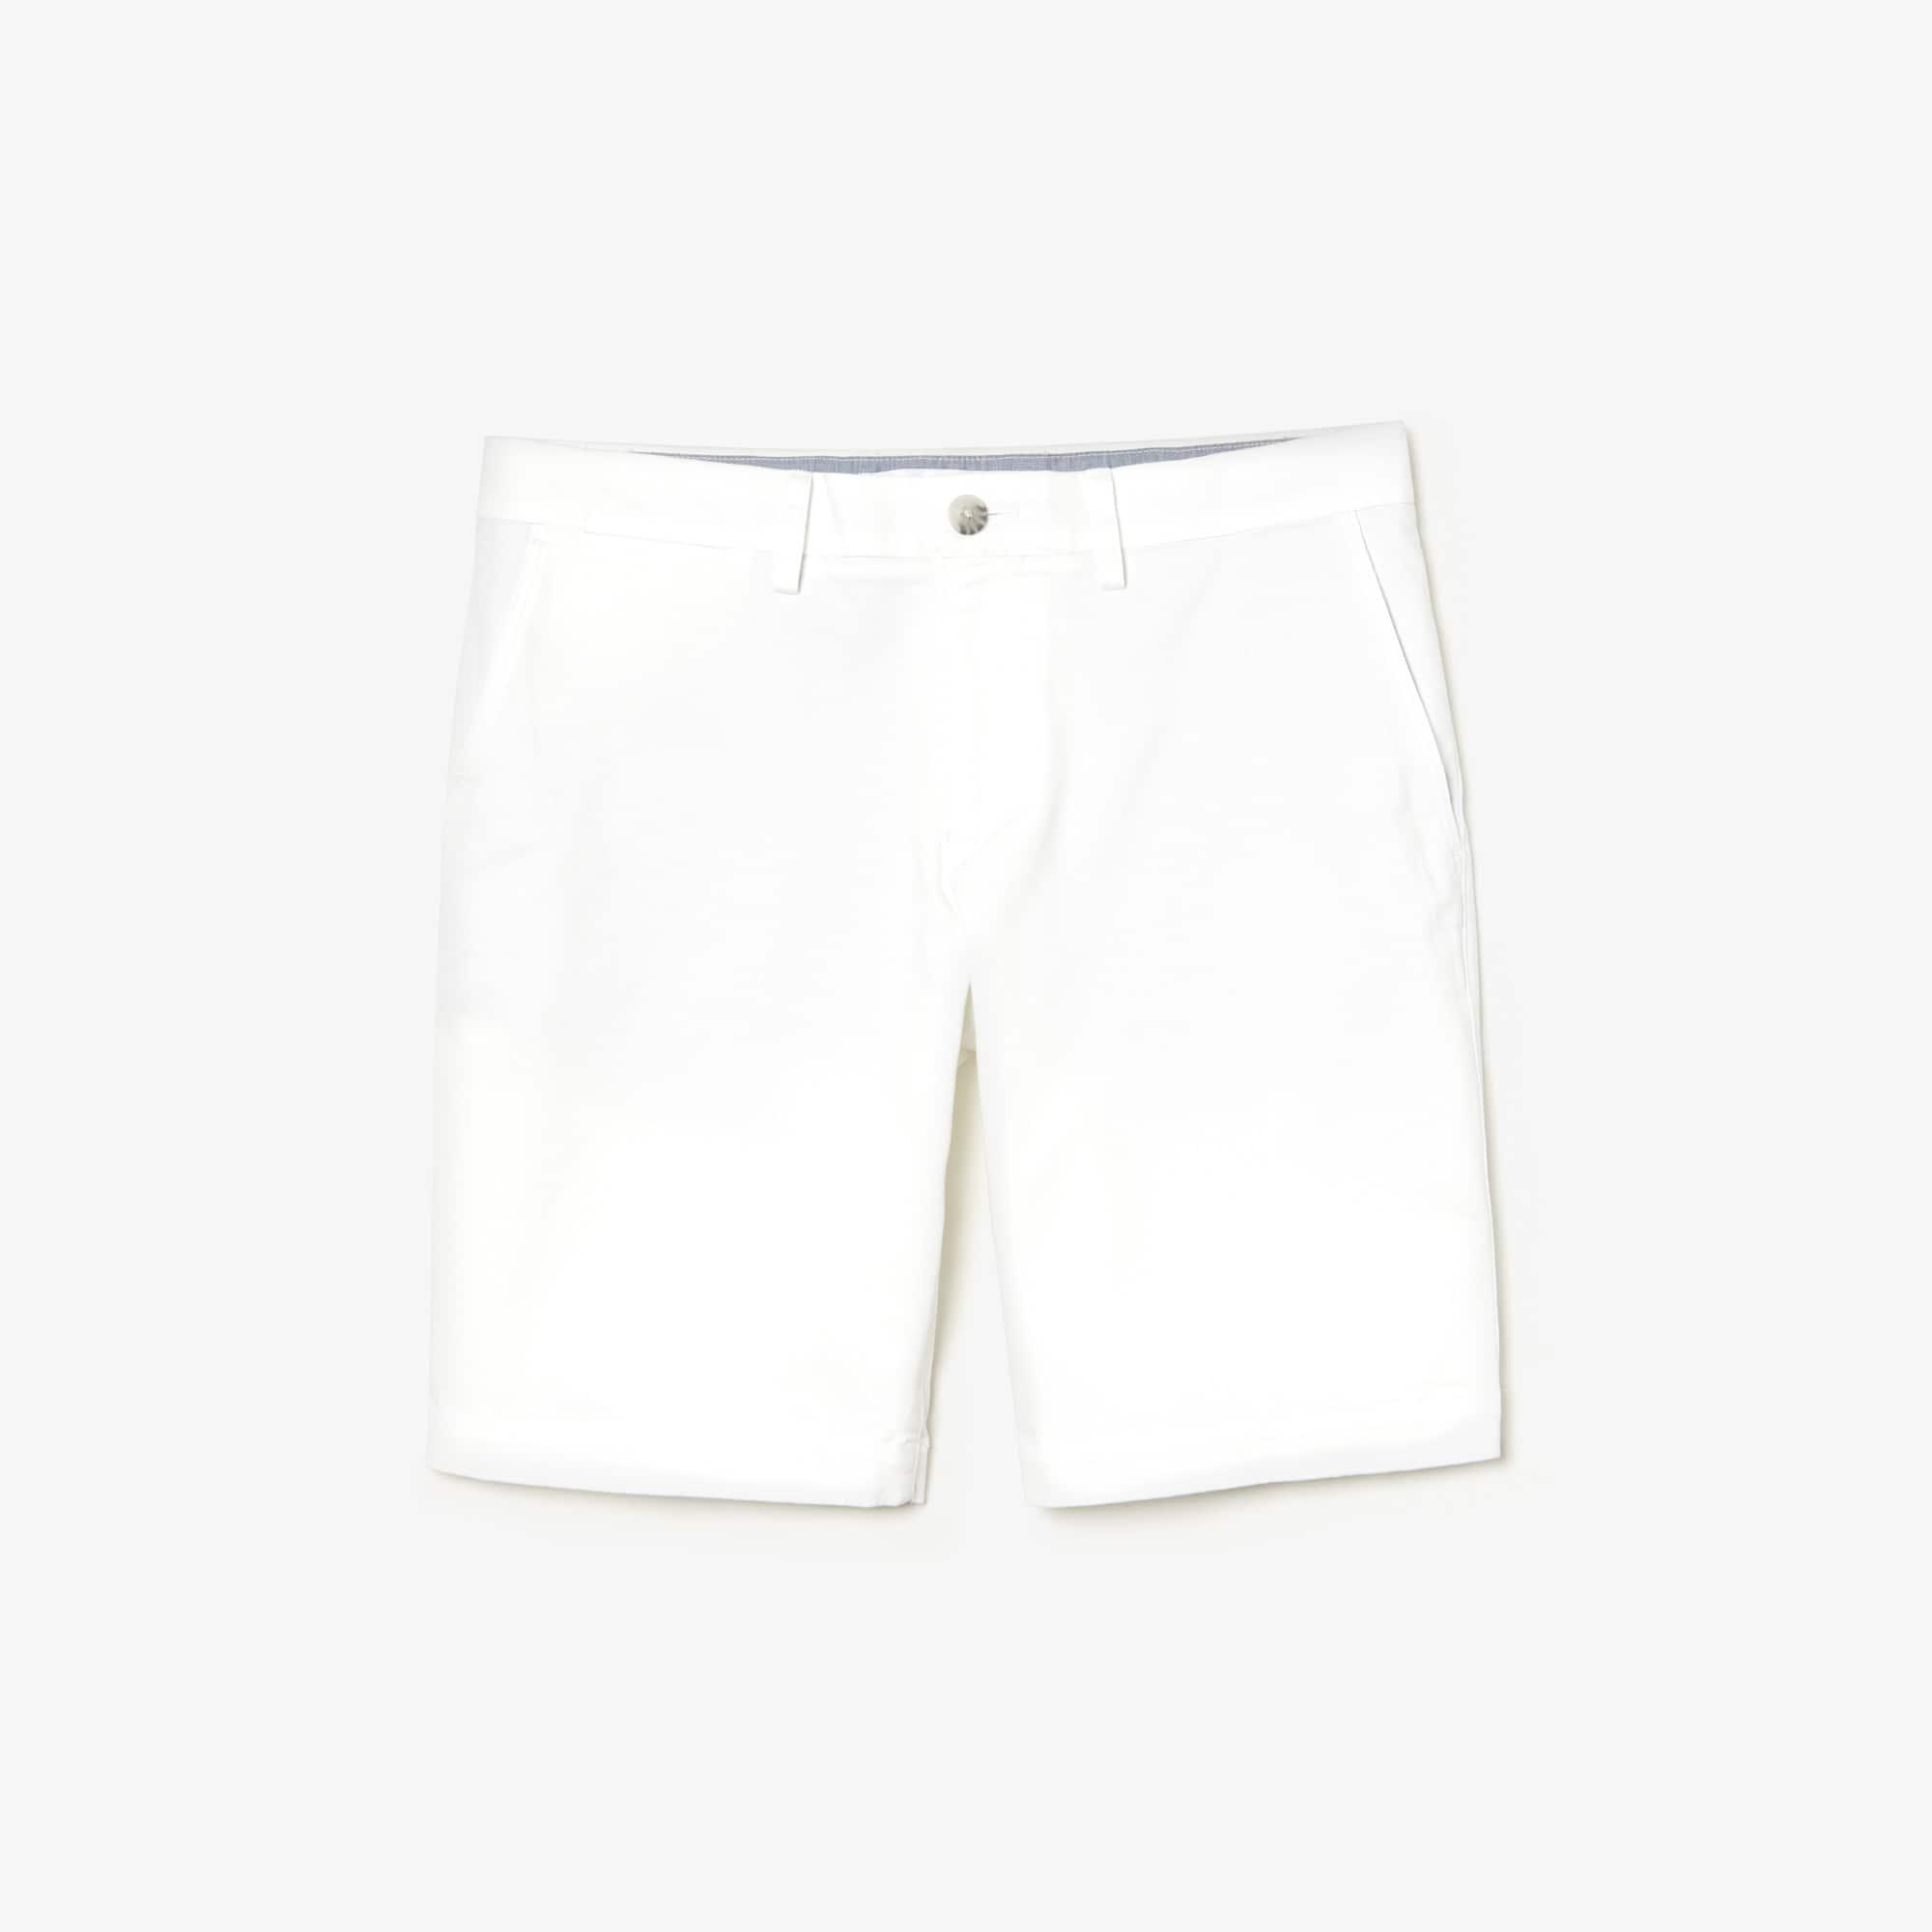 eeeed7c2f0 Men's Slim Fit Stretch Gabardine Shorts